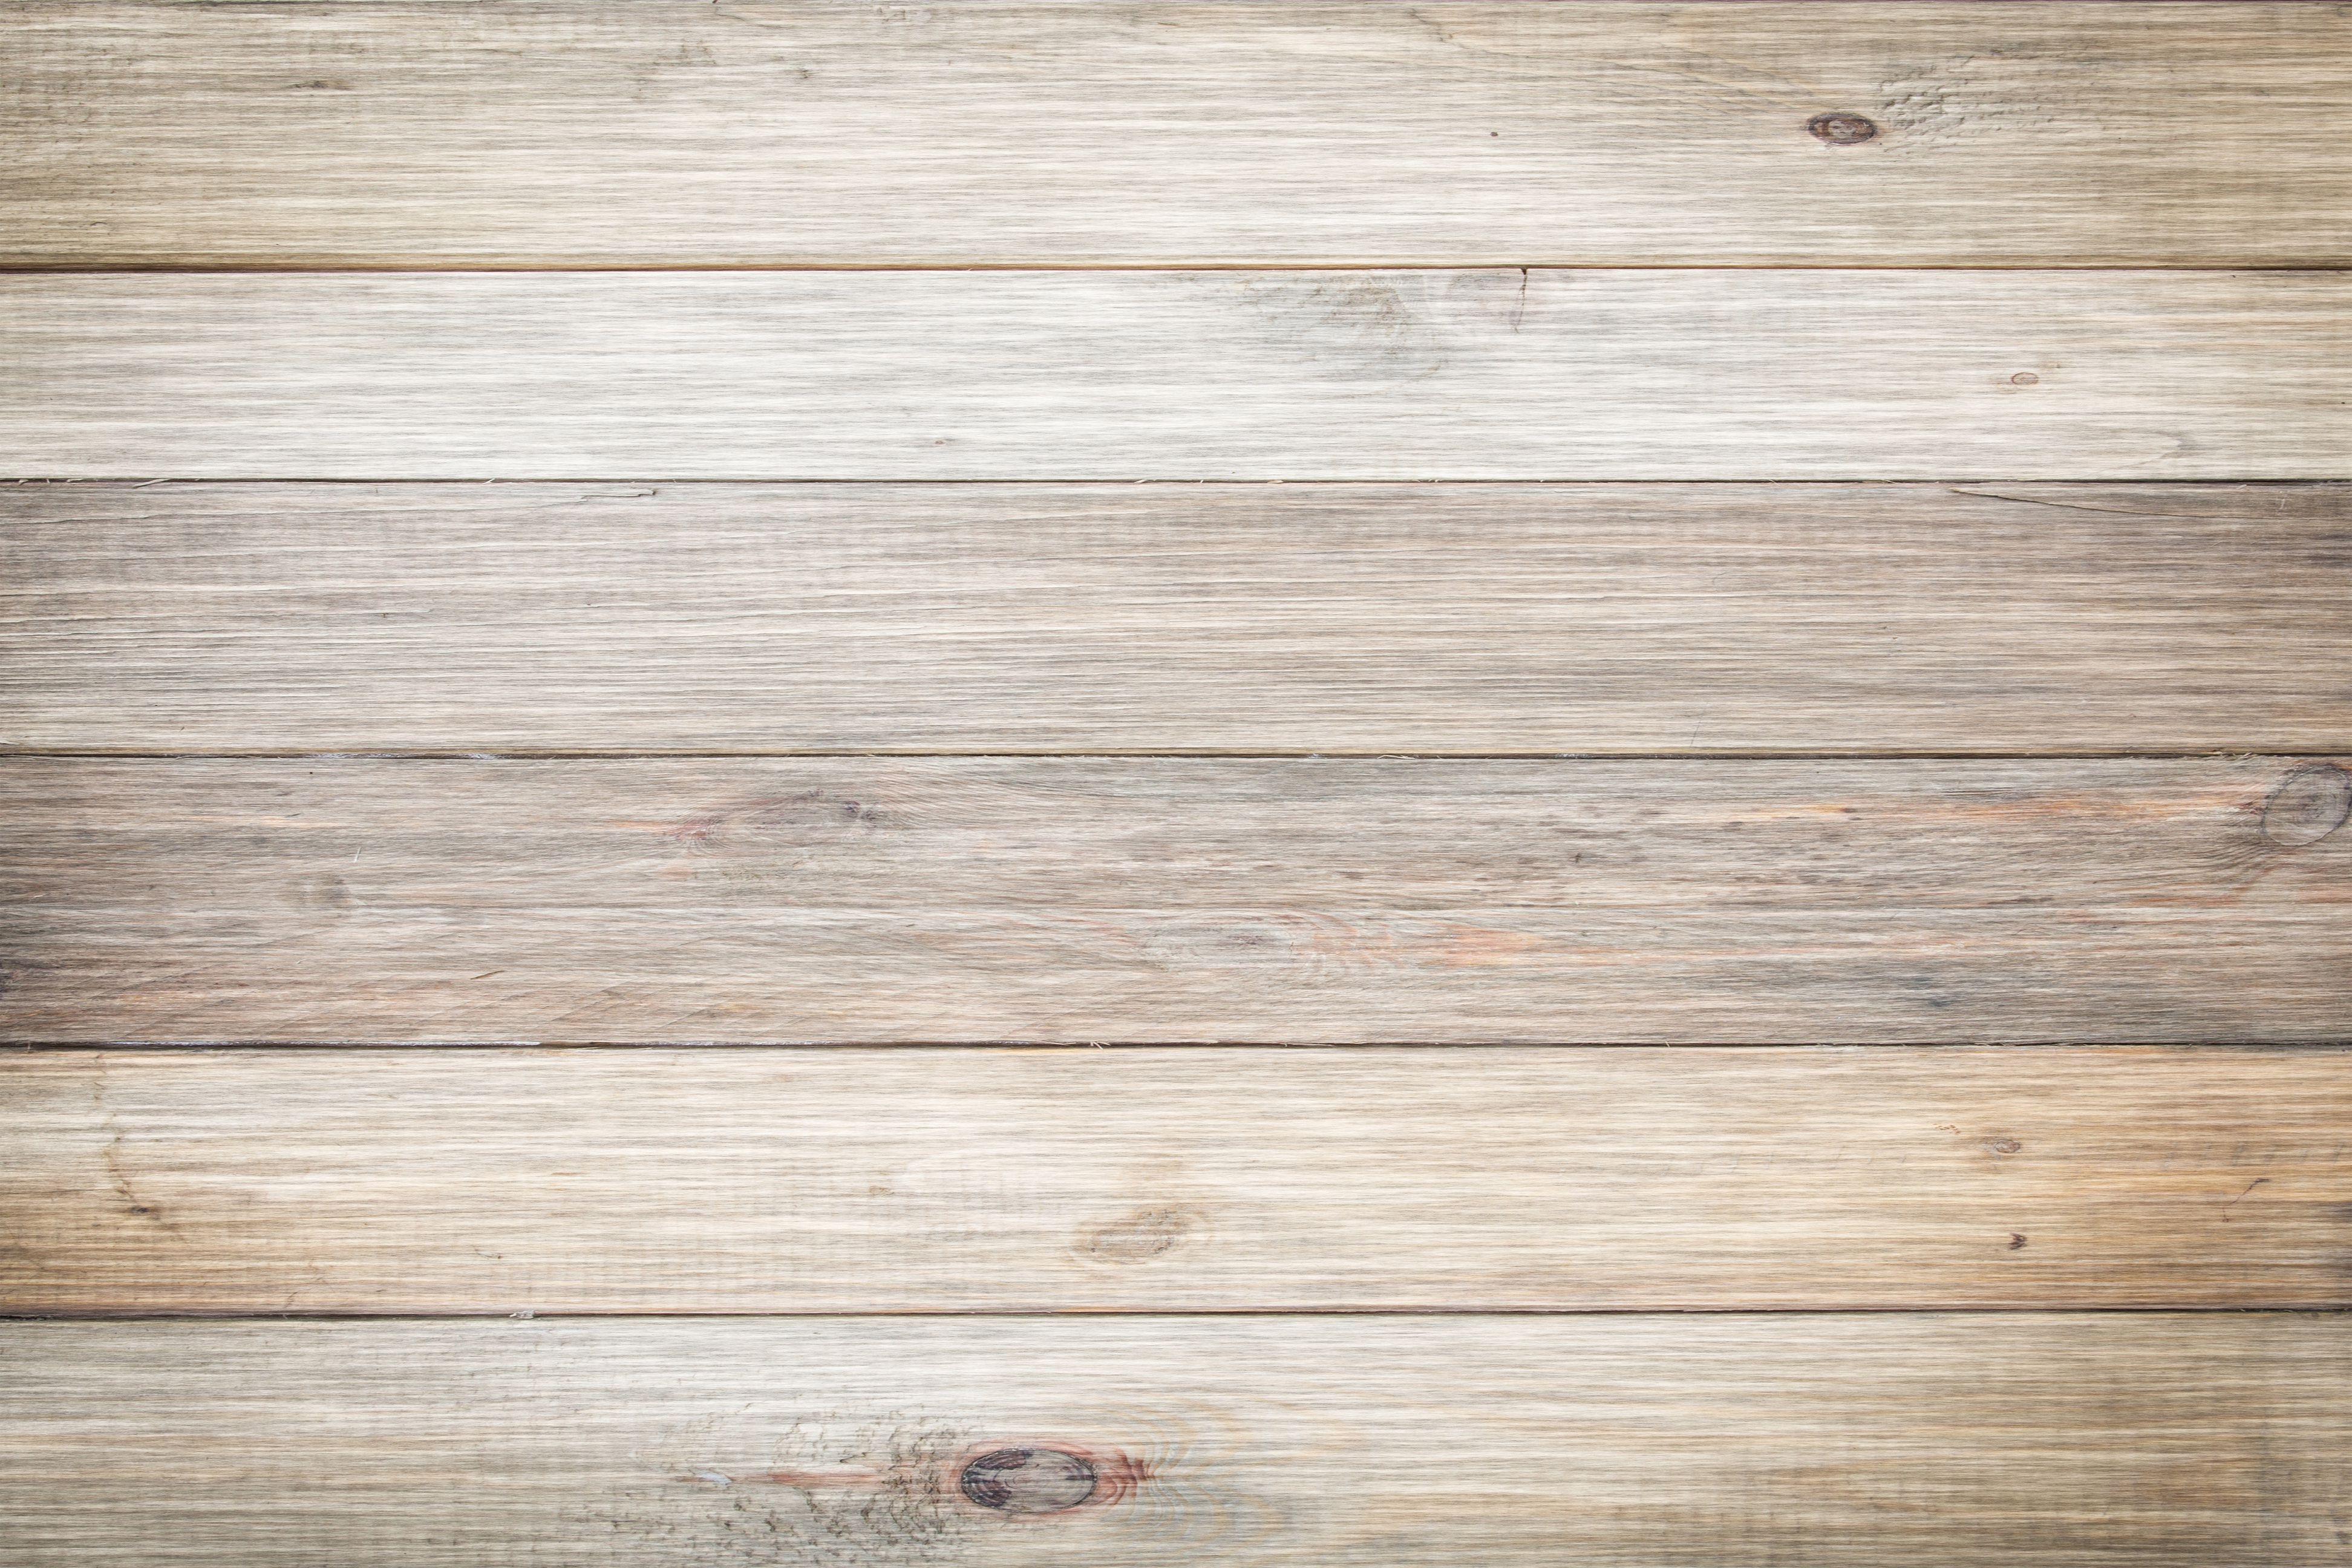 G-03木紋-06-004